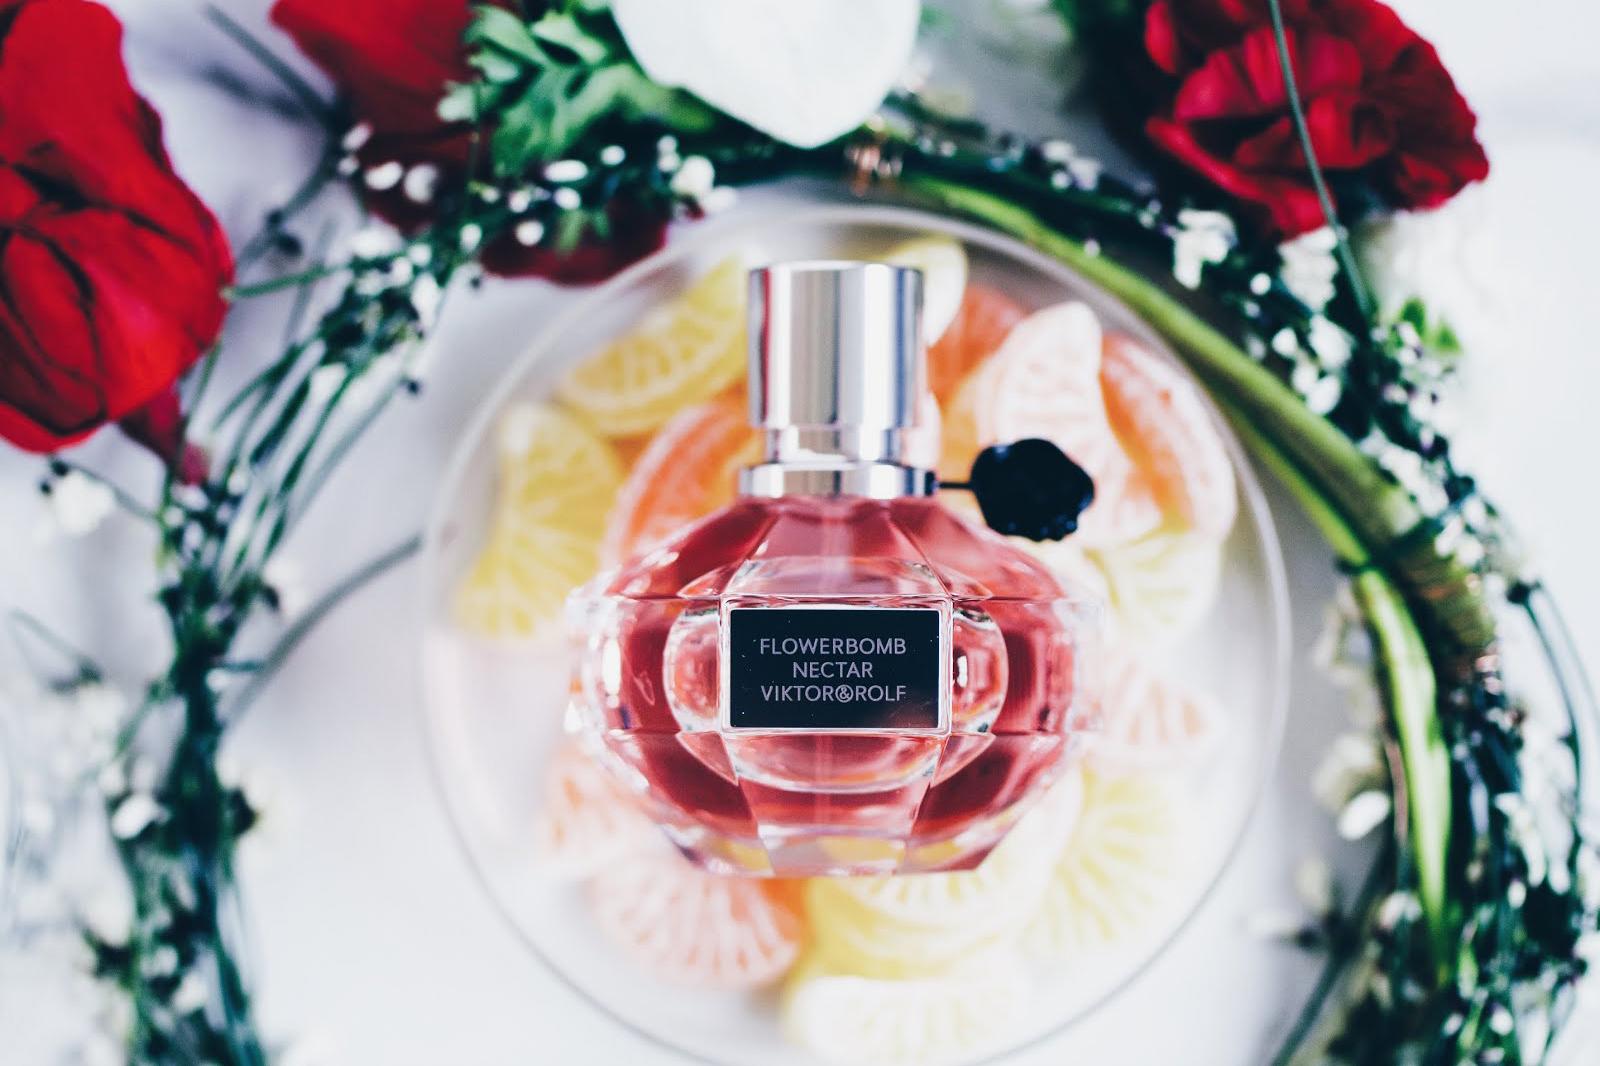 viktor rolf flowerbomb nectar avis test critique parfum